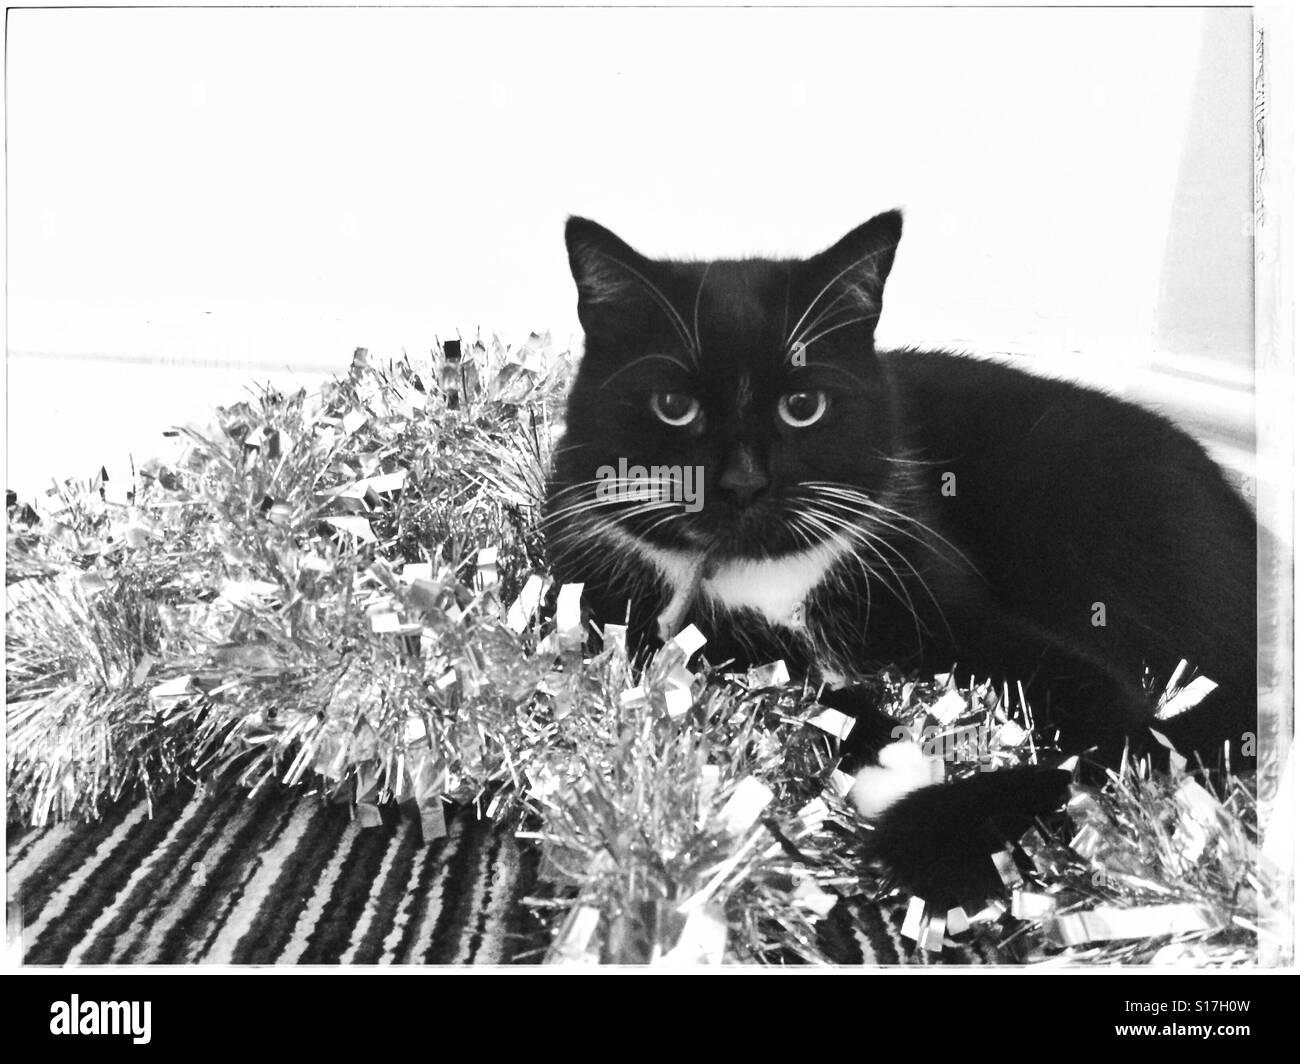 Black & white cat sitting on silver tinsel Stock Photo